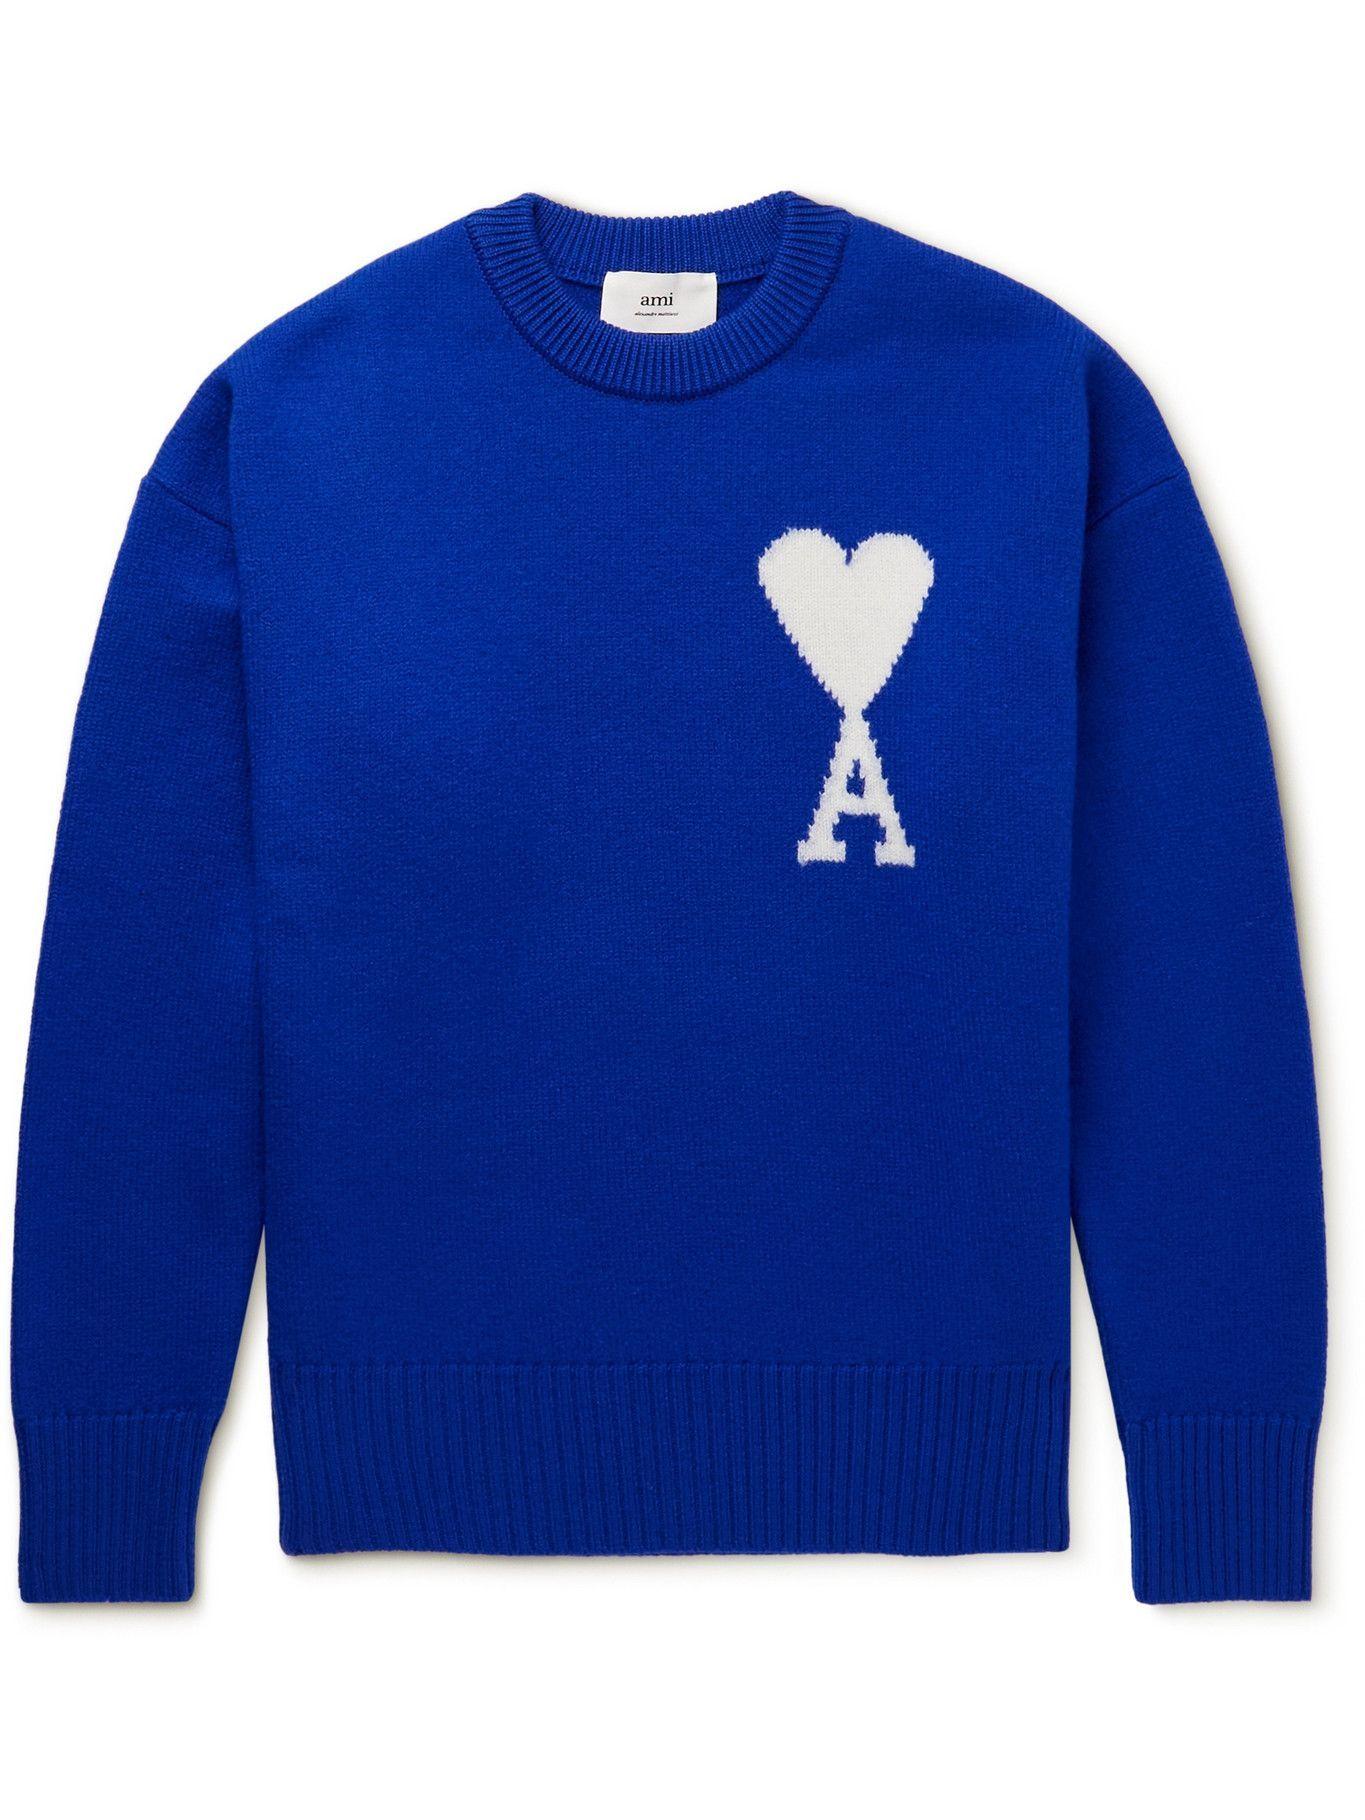 Photo: AMI PARIS - Intarsia Wool Sweater - Blue